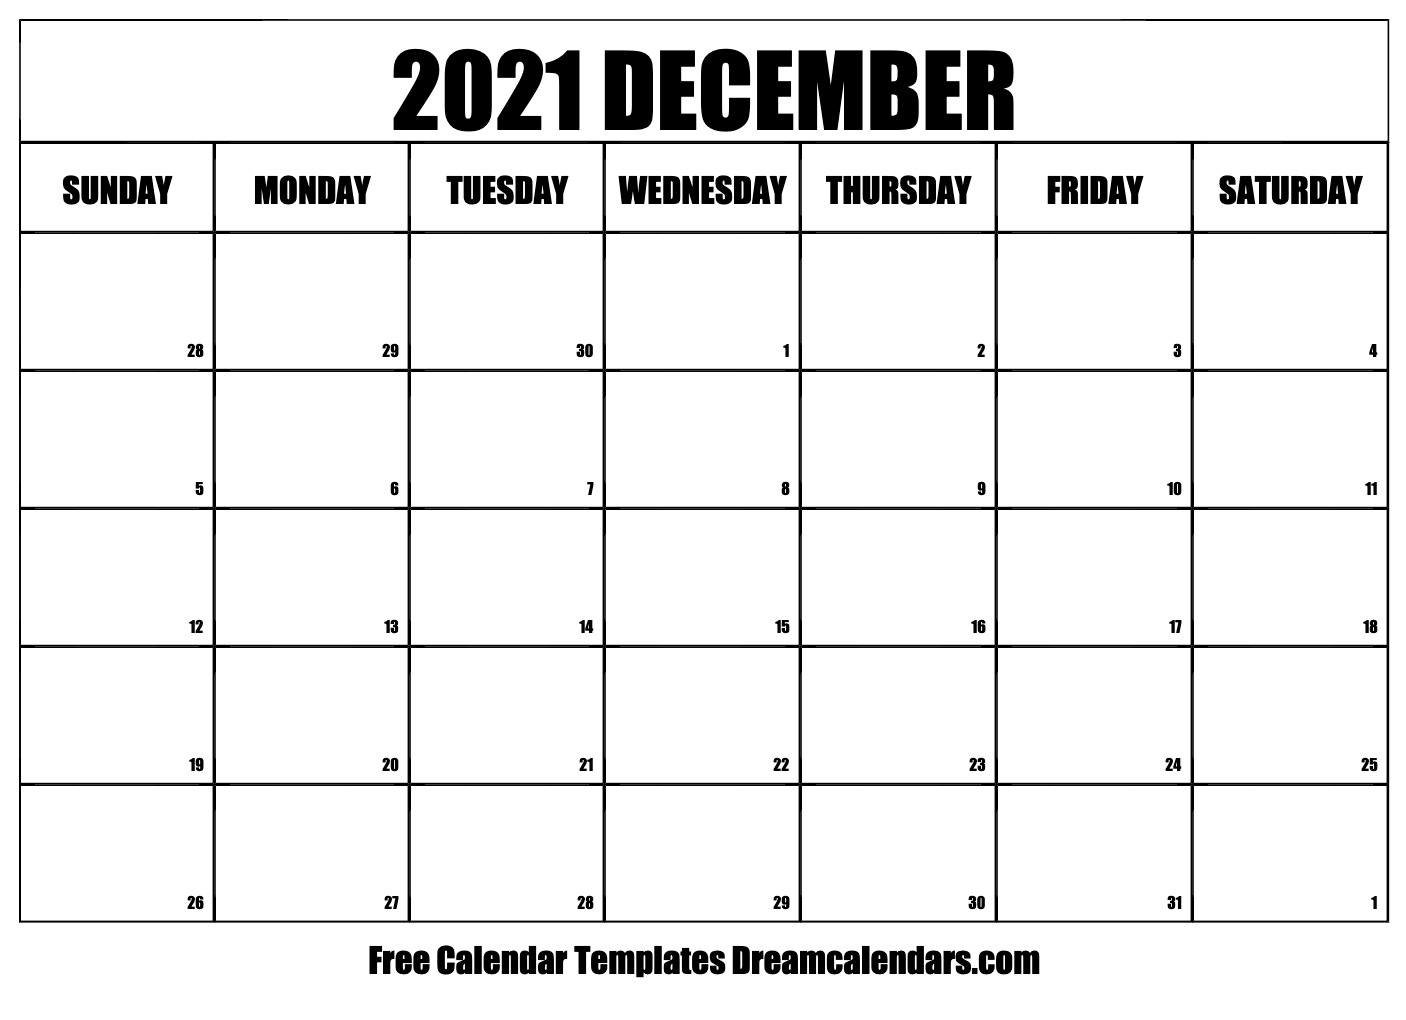 December 2021 Calendar | Free Blank Printable Templates In Printable Sunrise Sunset Calendar 2021